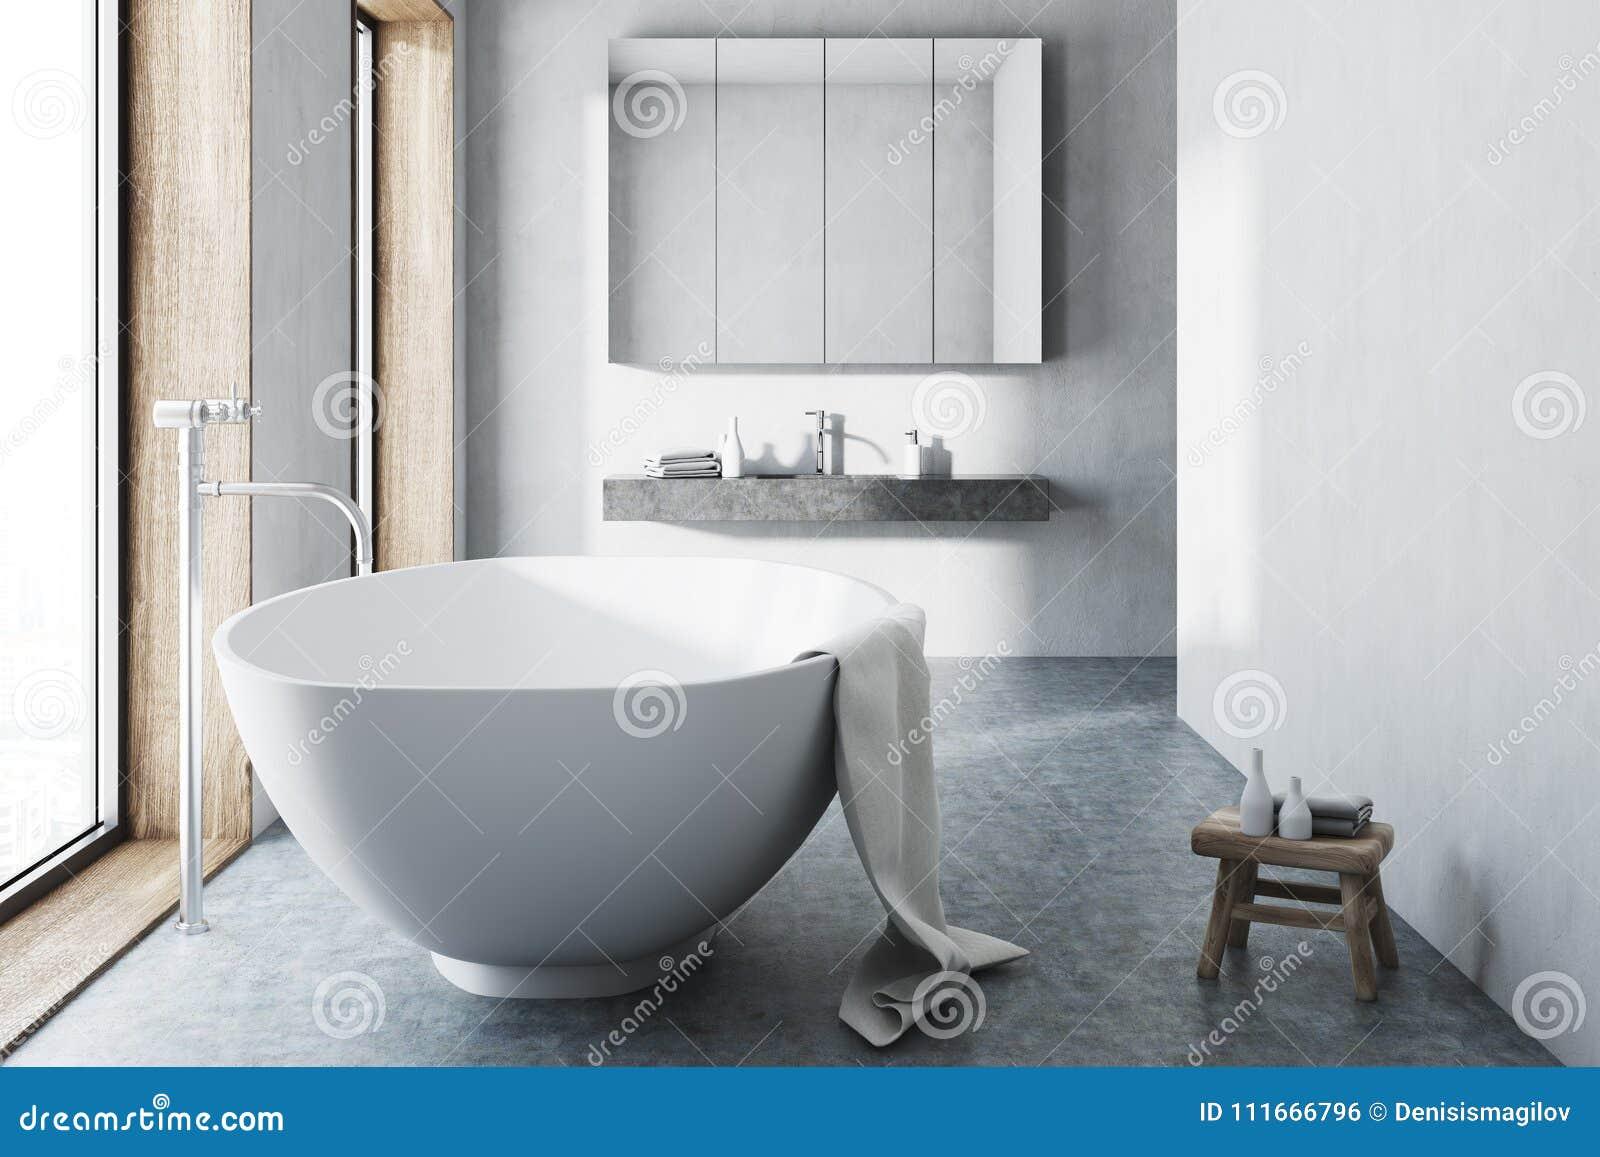 Weisses Badezimmer Weisse Wanne Konkreter Boden Stock Abbildung